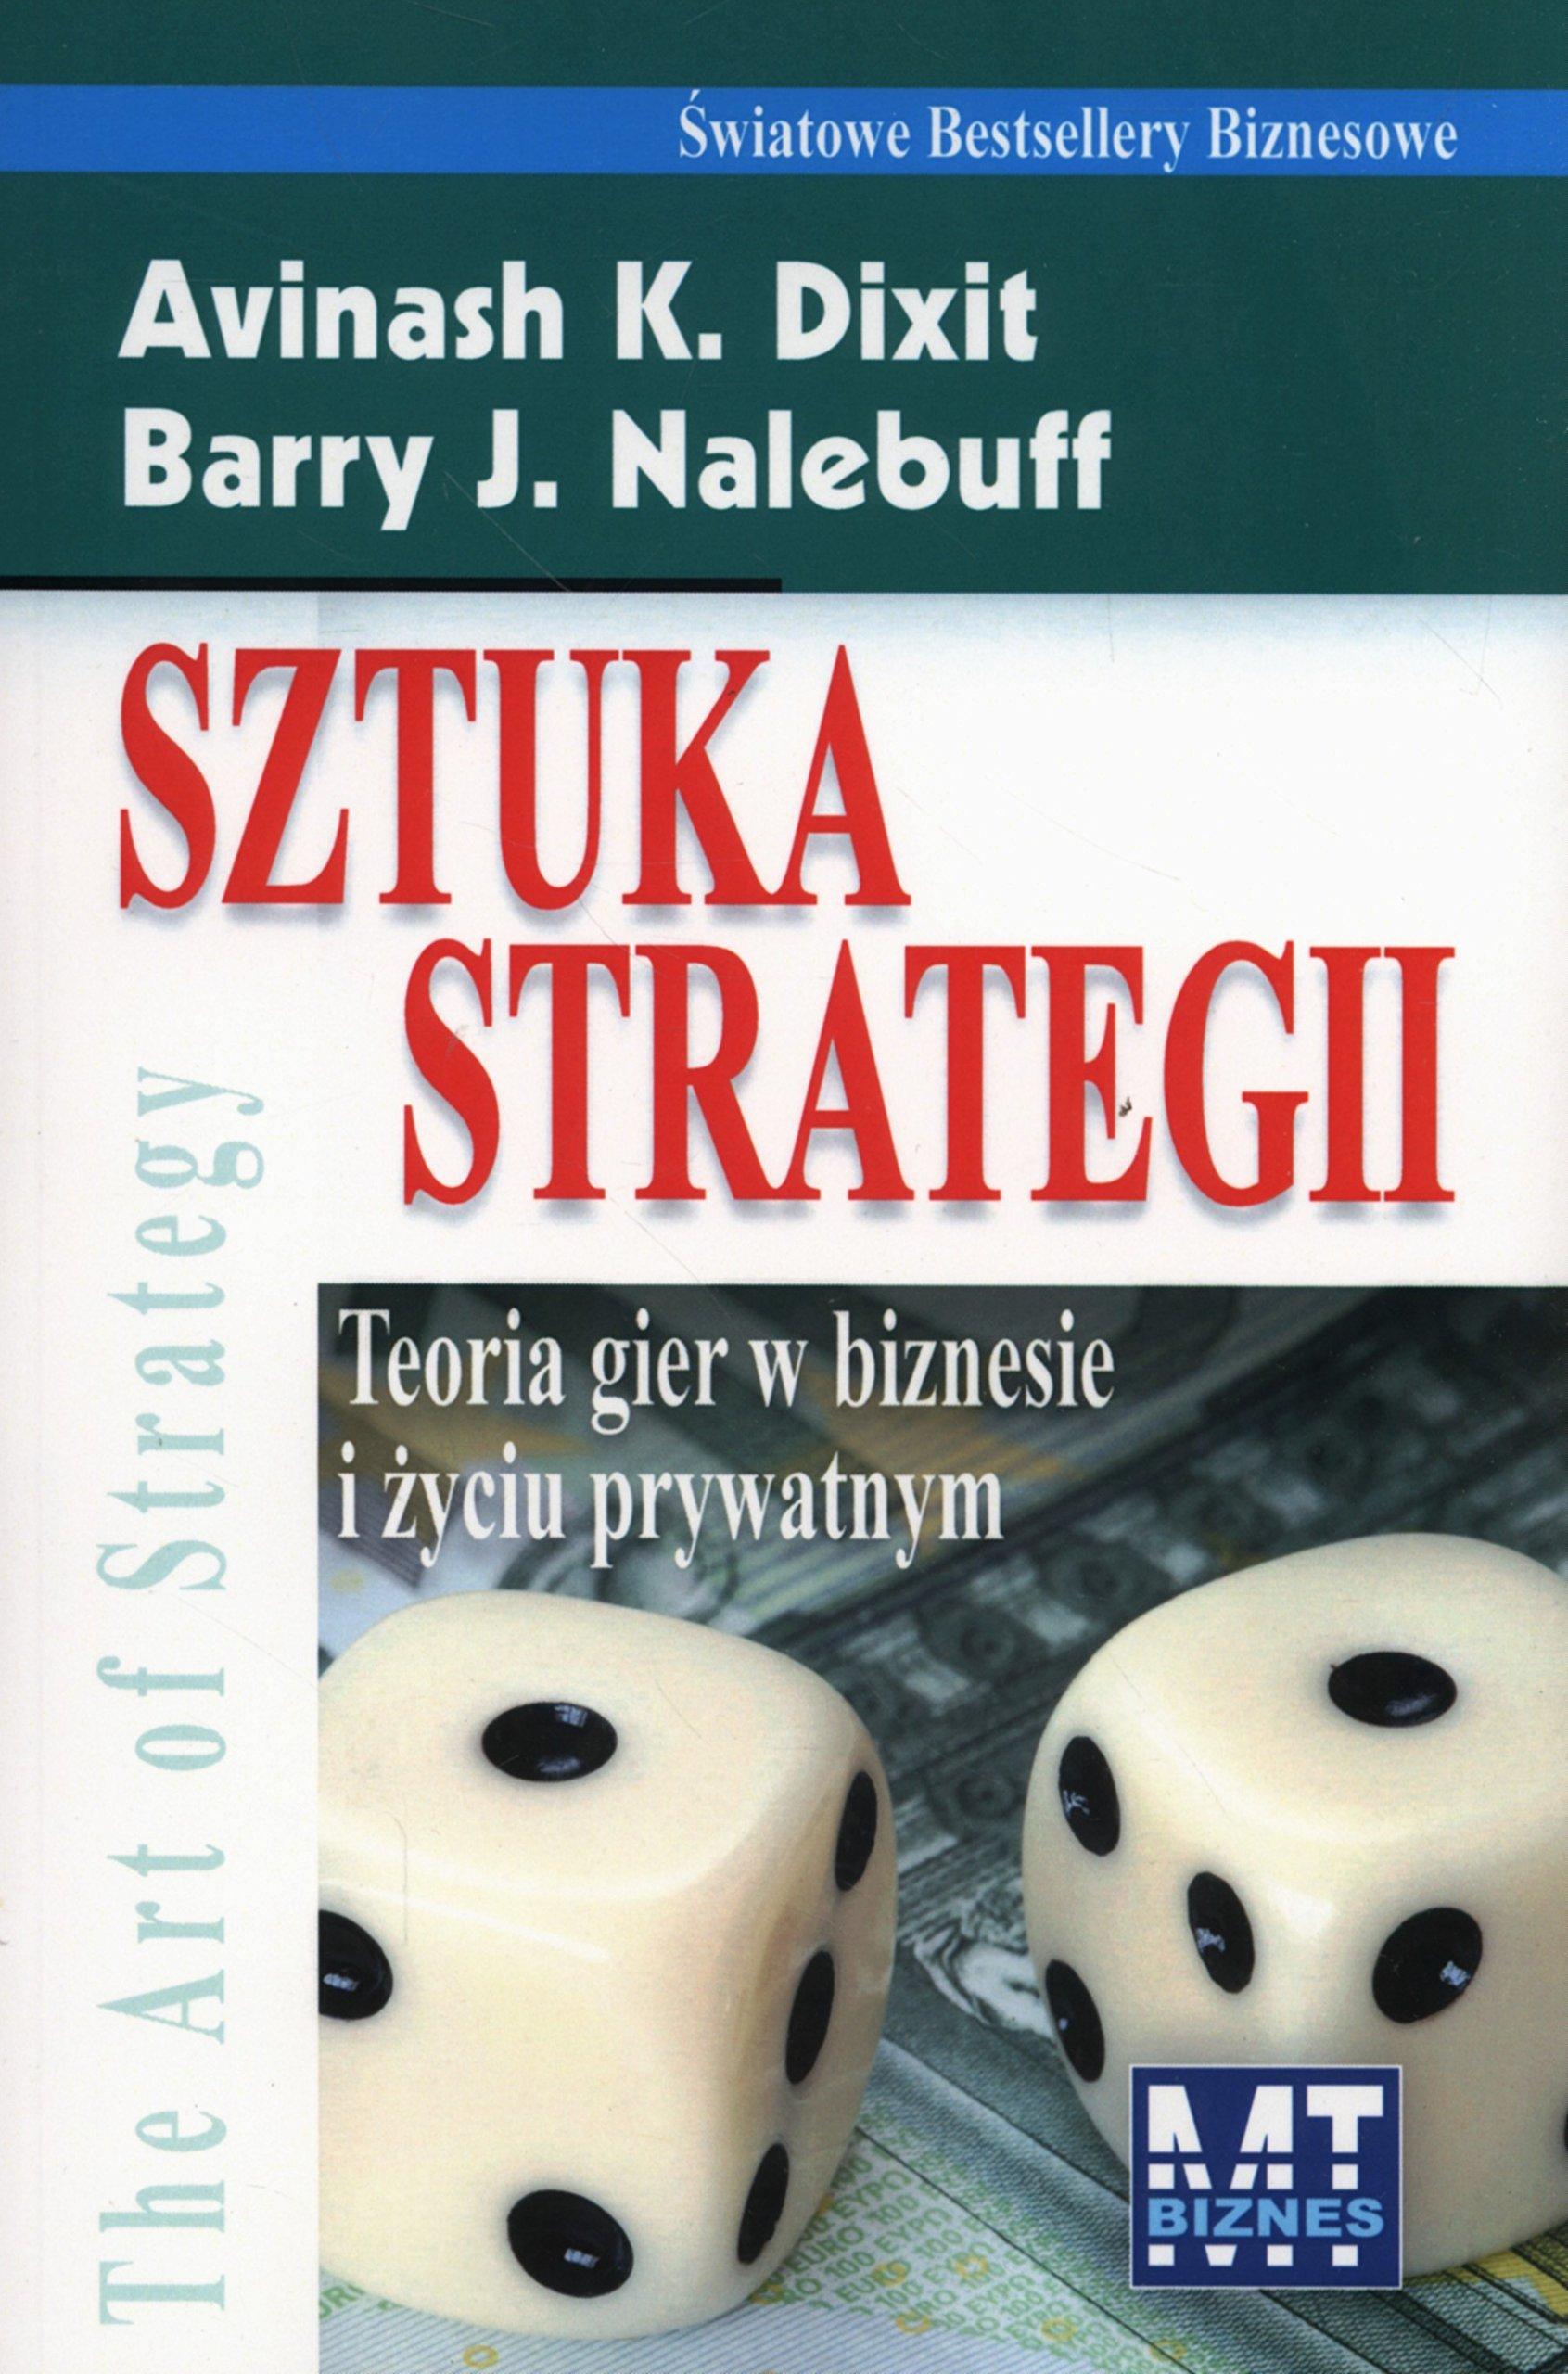 Sztuka Strategii: Amazon.es: Dixit, Avinash K., Nalebuff, Barry J.: Libros en idiomas extranjeros